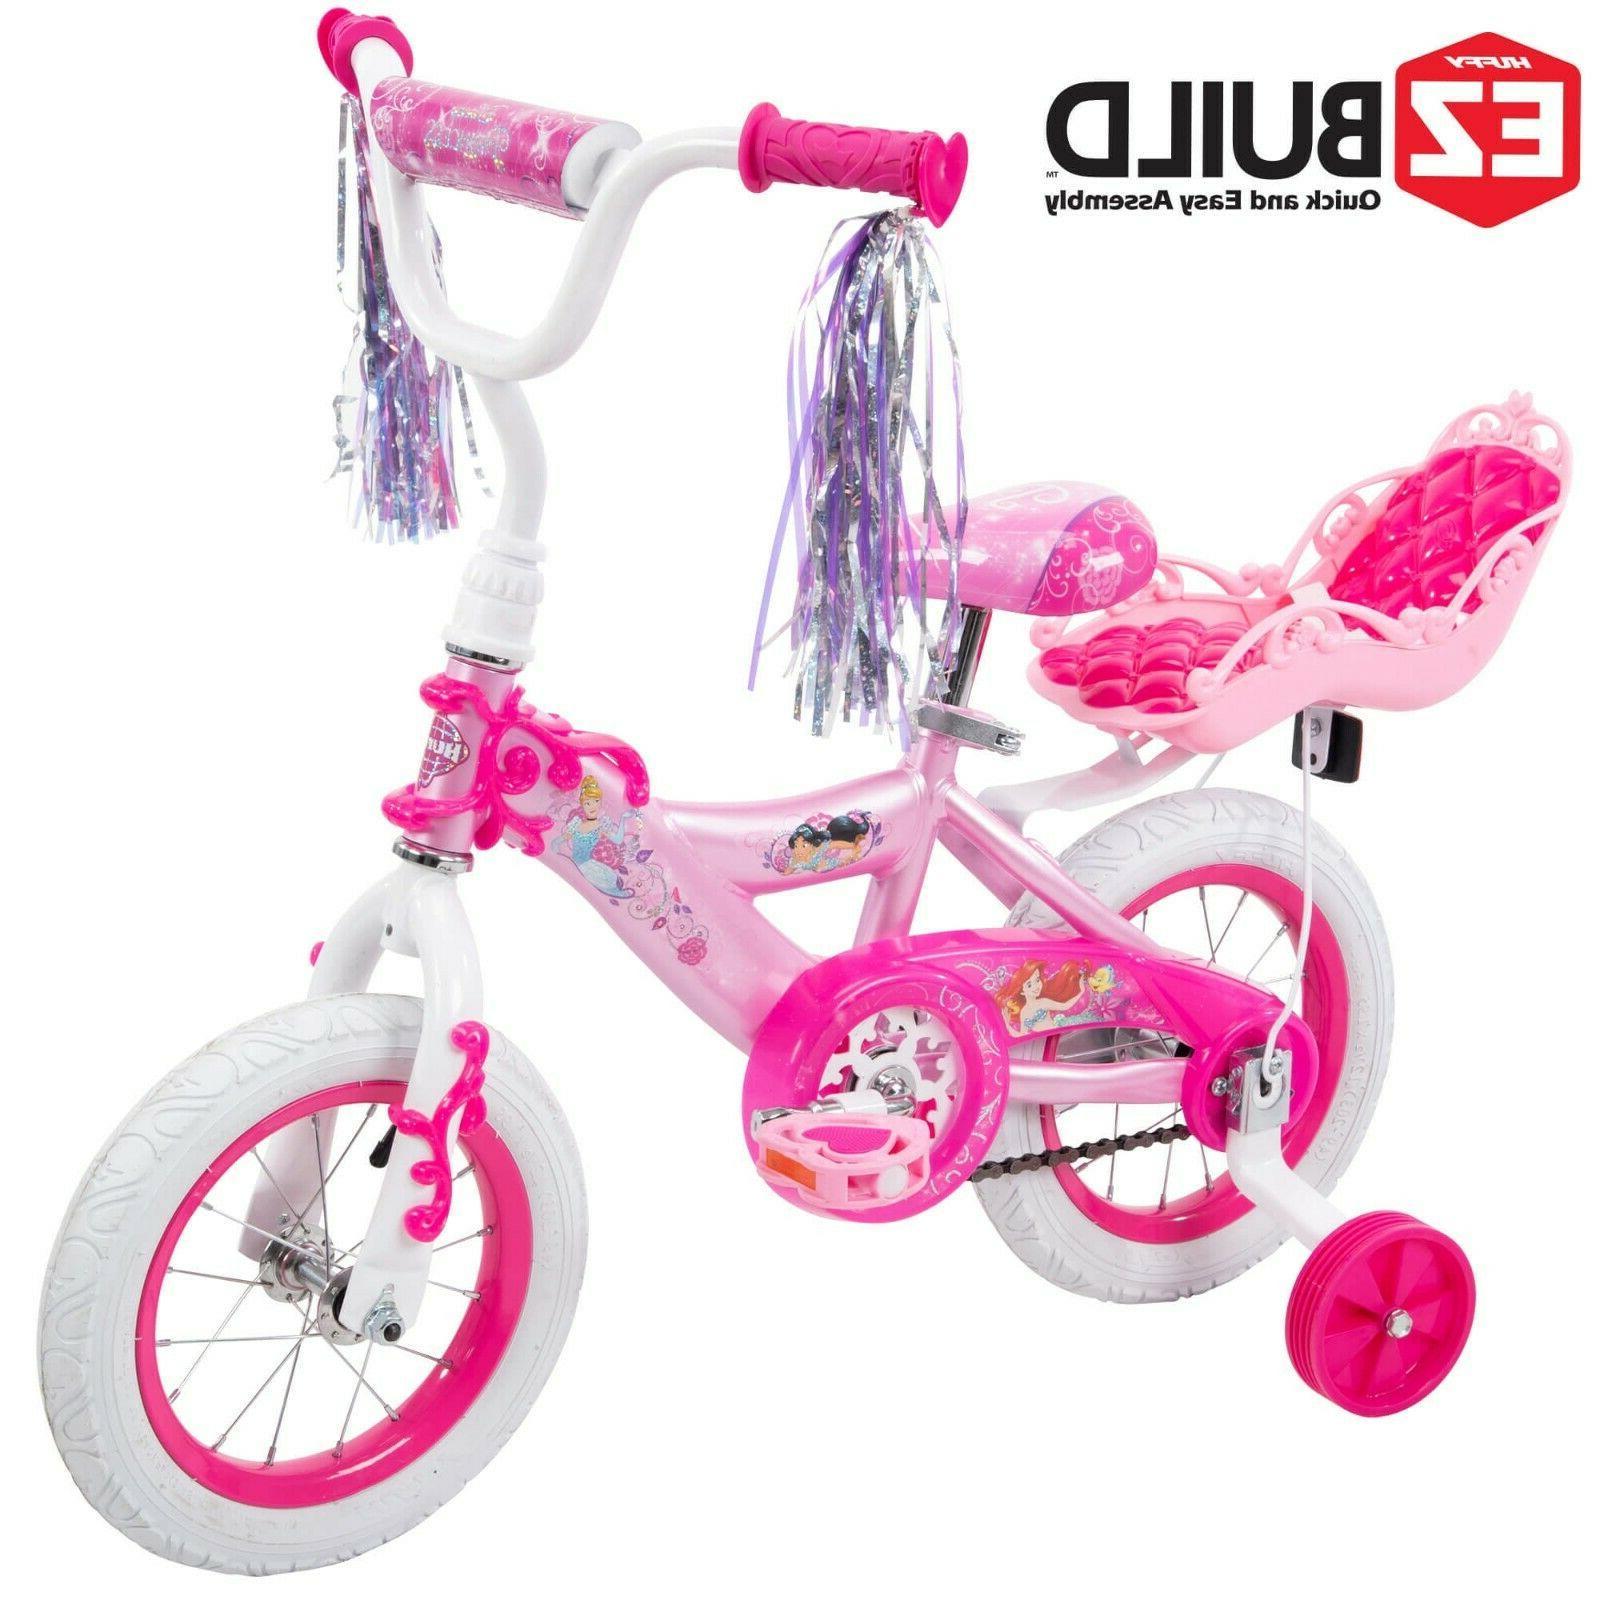 "Disney Princess 12"" Girls' EZ Build Bike with Doll Carrier,"